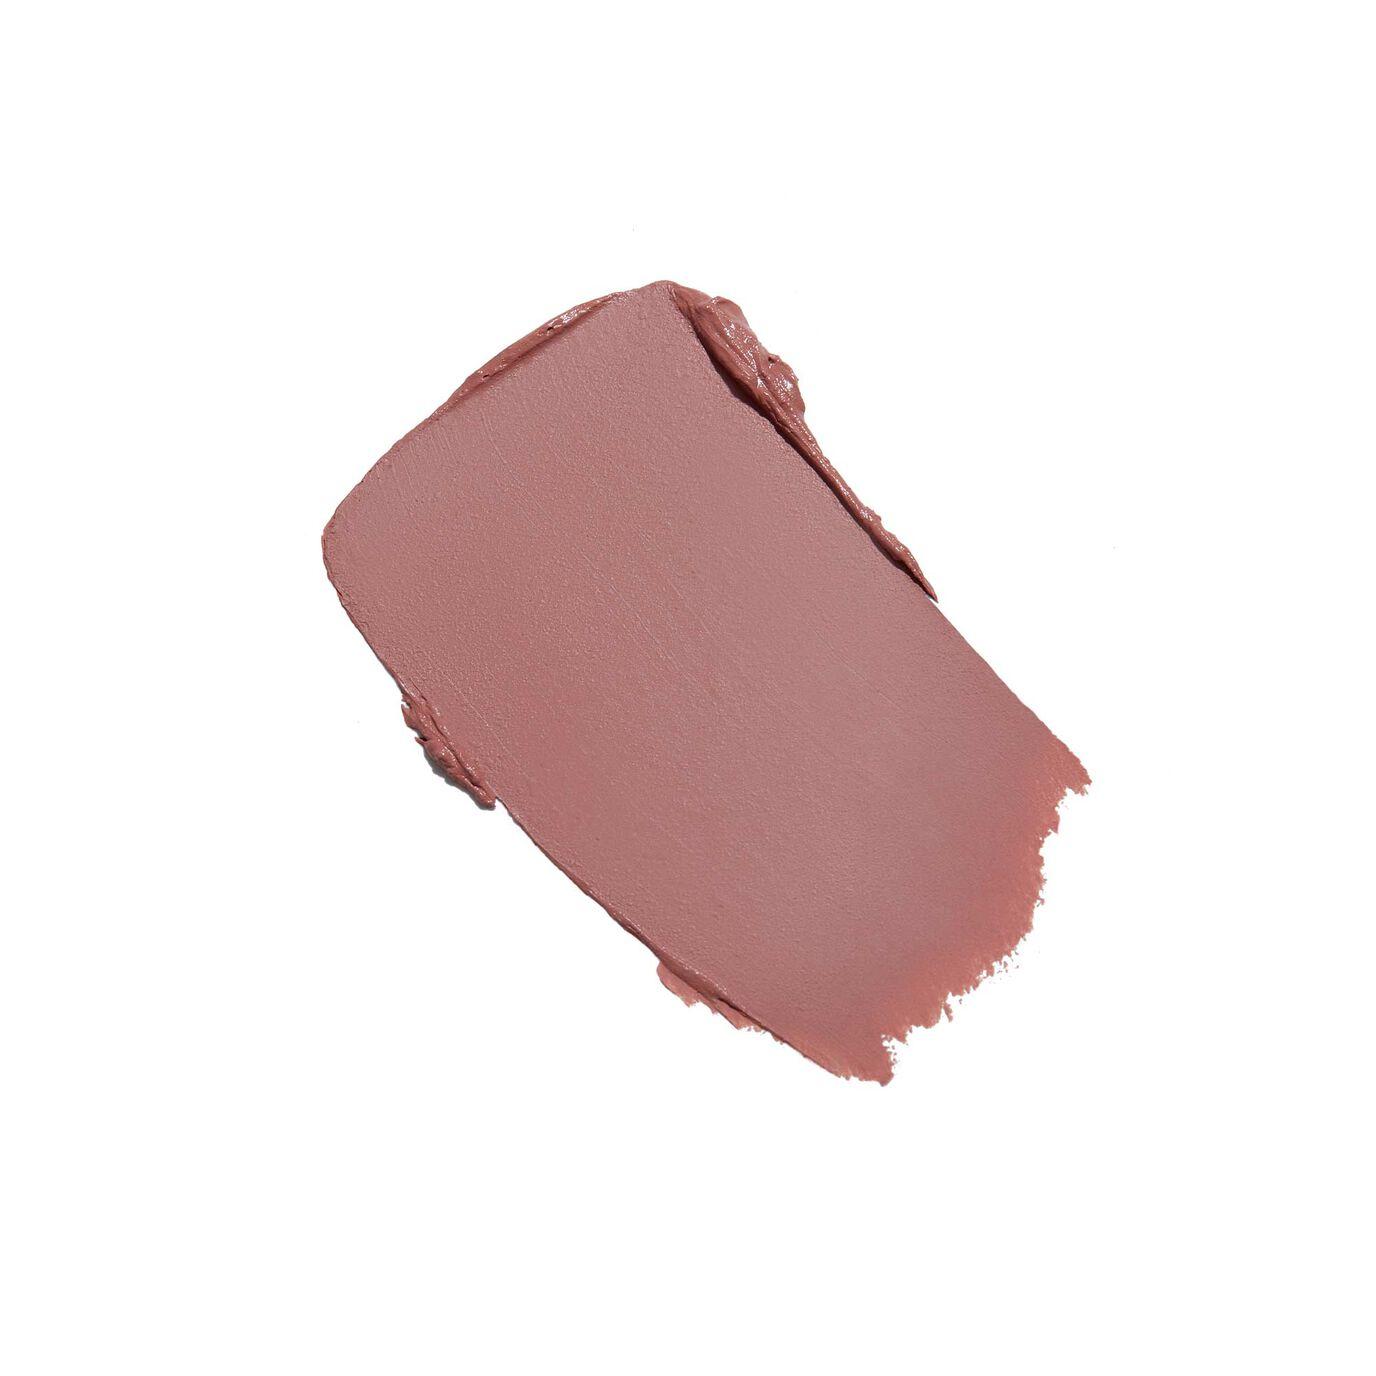 Stick Blush - Latte